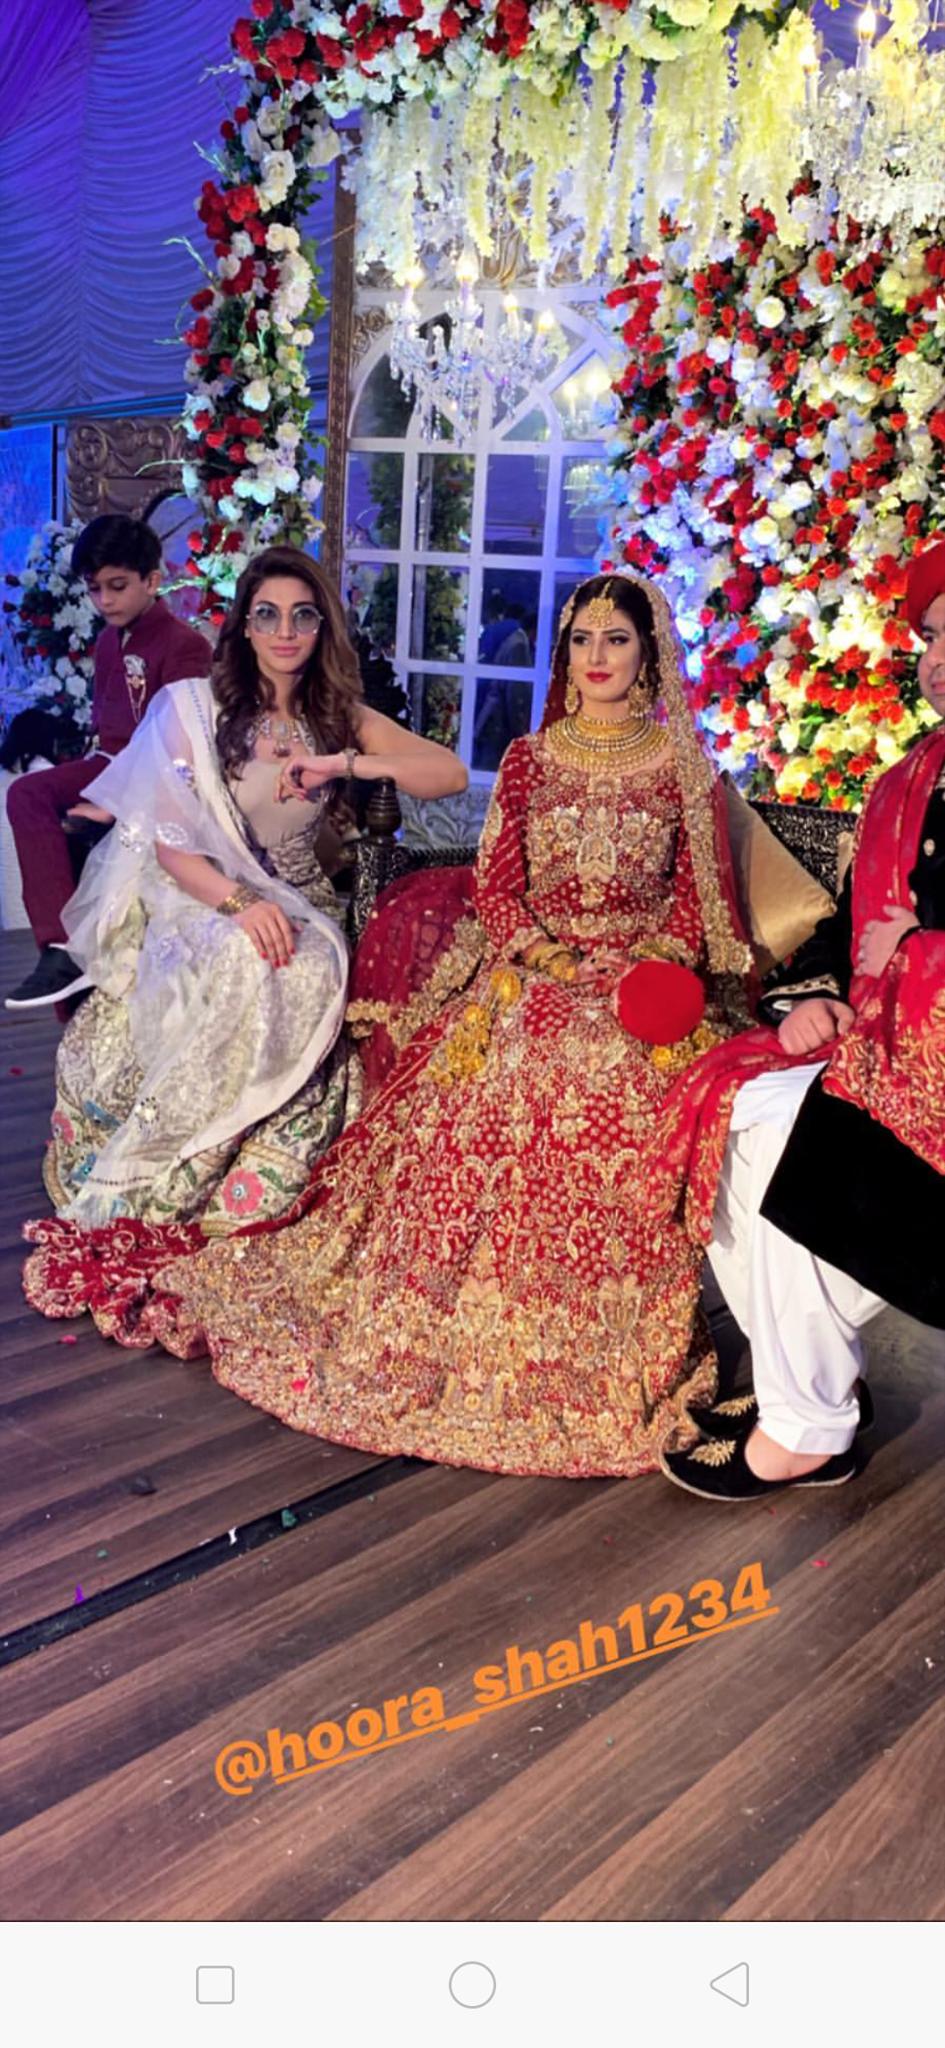 Beautiful Clicks Of Sana Fakhar At A Family Wedding Event